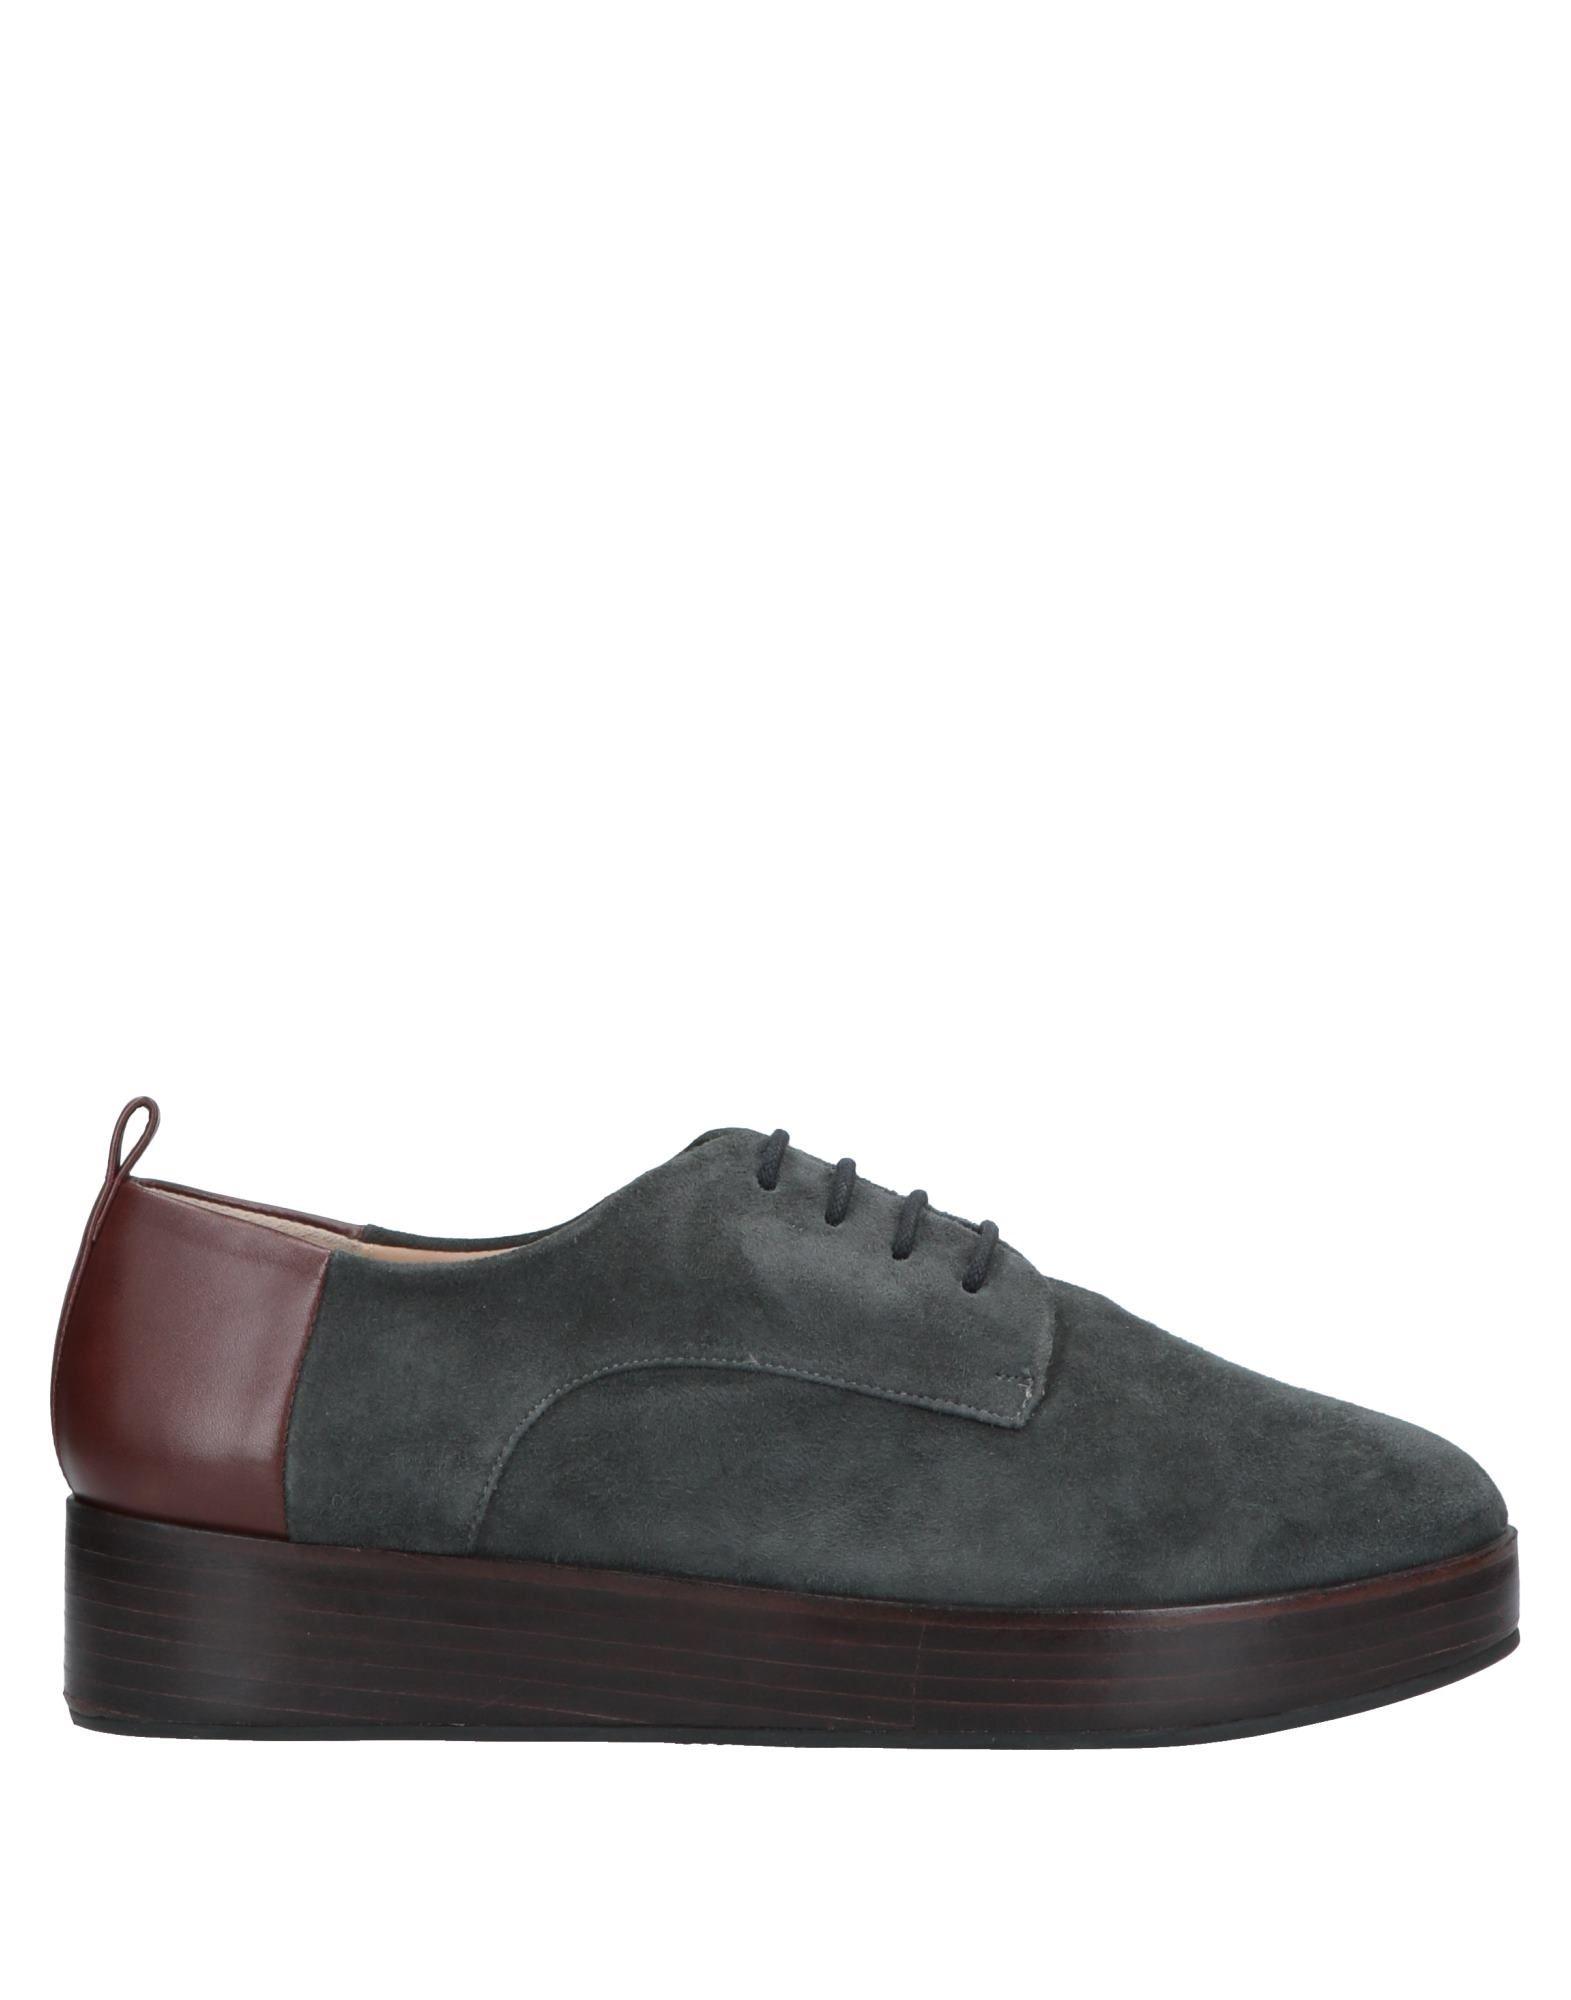 MIGUEL PALACIO for HOSS INTROPIA Обувь на шнурках